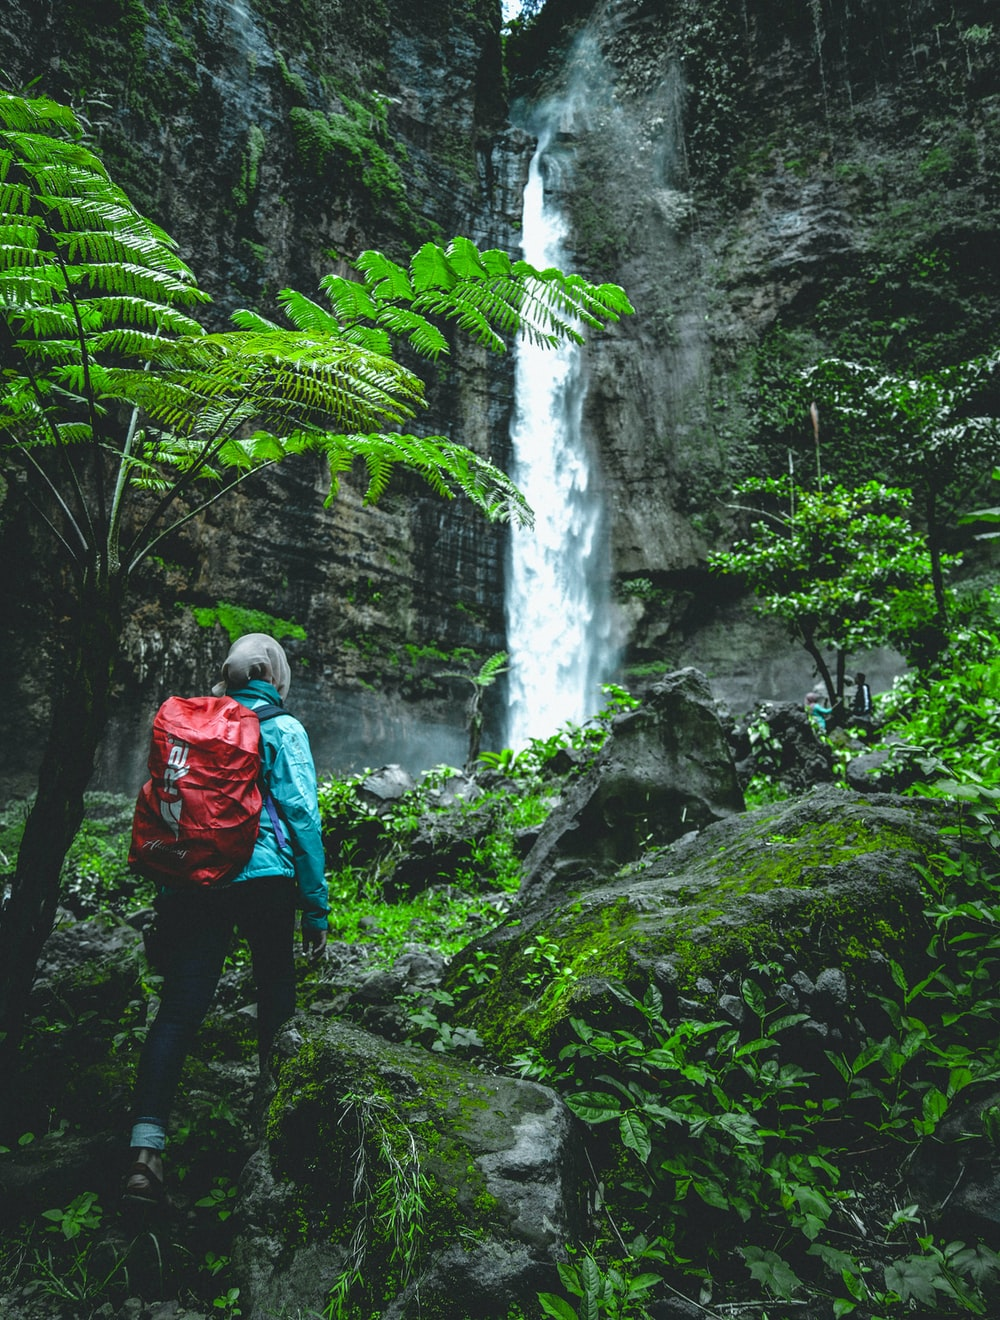 person walking towards waterfall at daytime